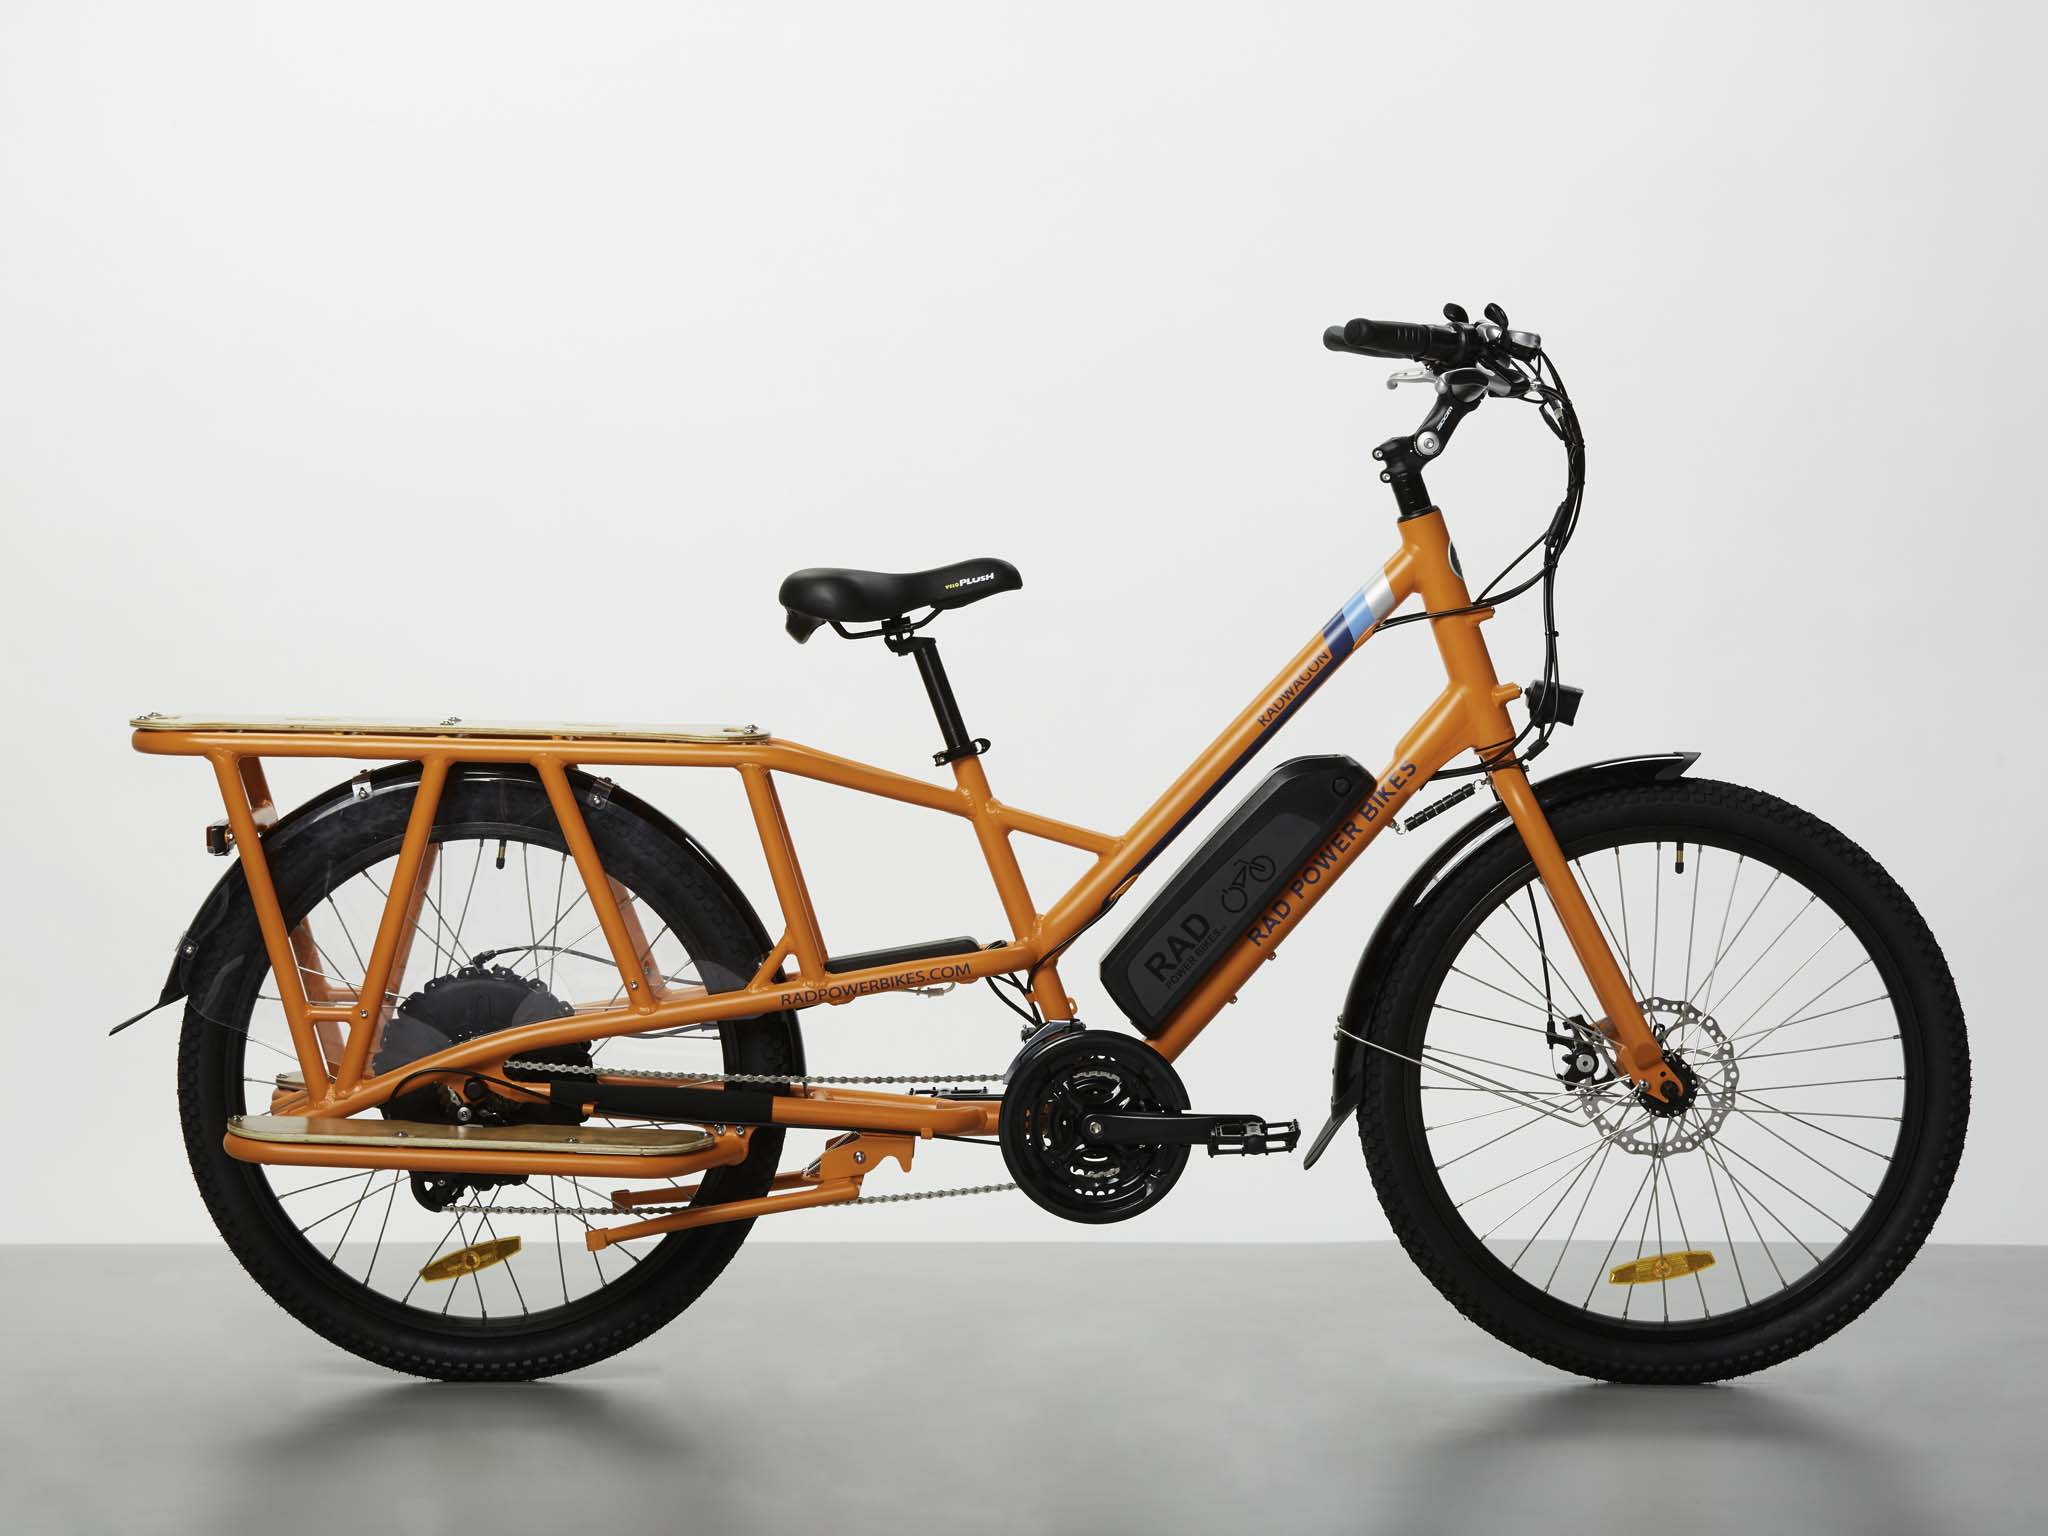 Universal Electric Cargo Tricycle Wiring Diagram Free Download Pin Trike On Pinterest Moreover Vw Jetta Stereo Radwagon Bike Rad Power Bikes